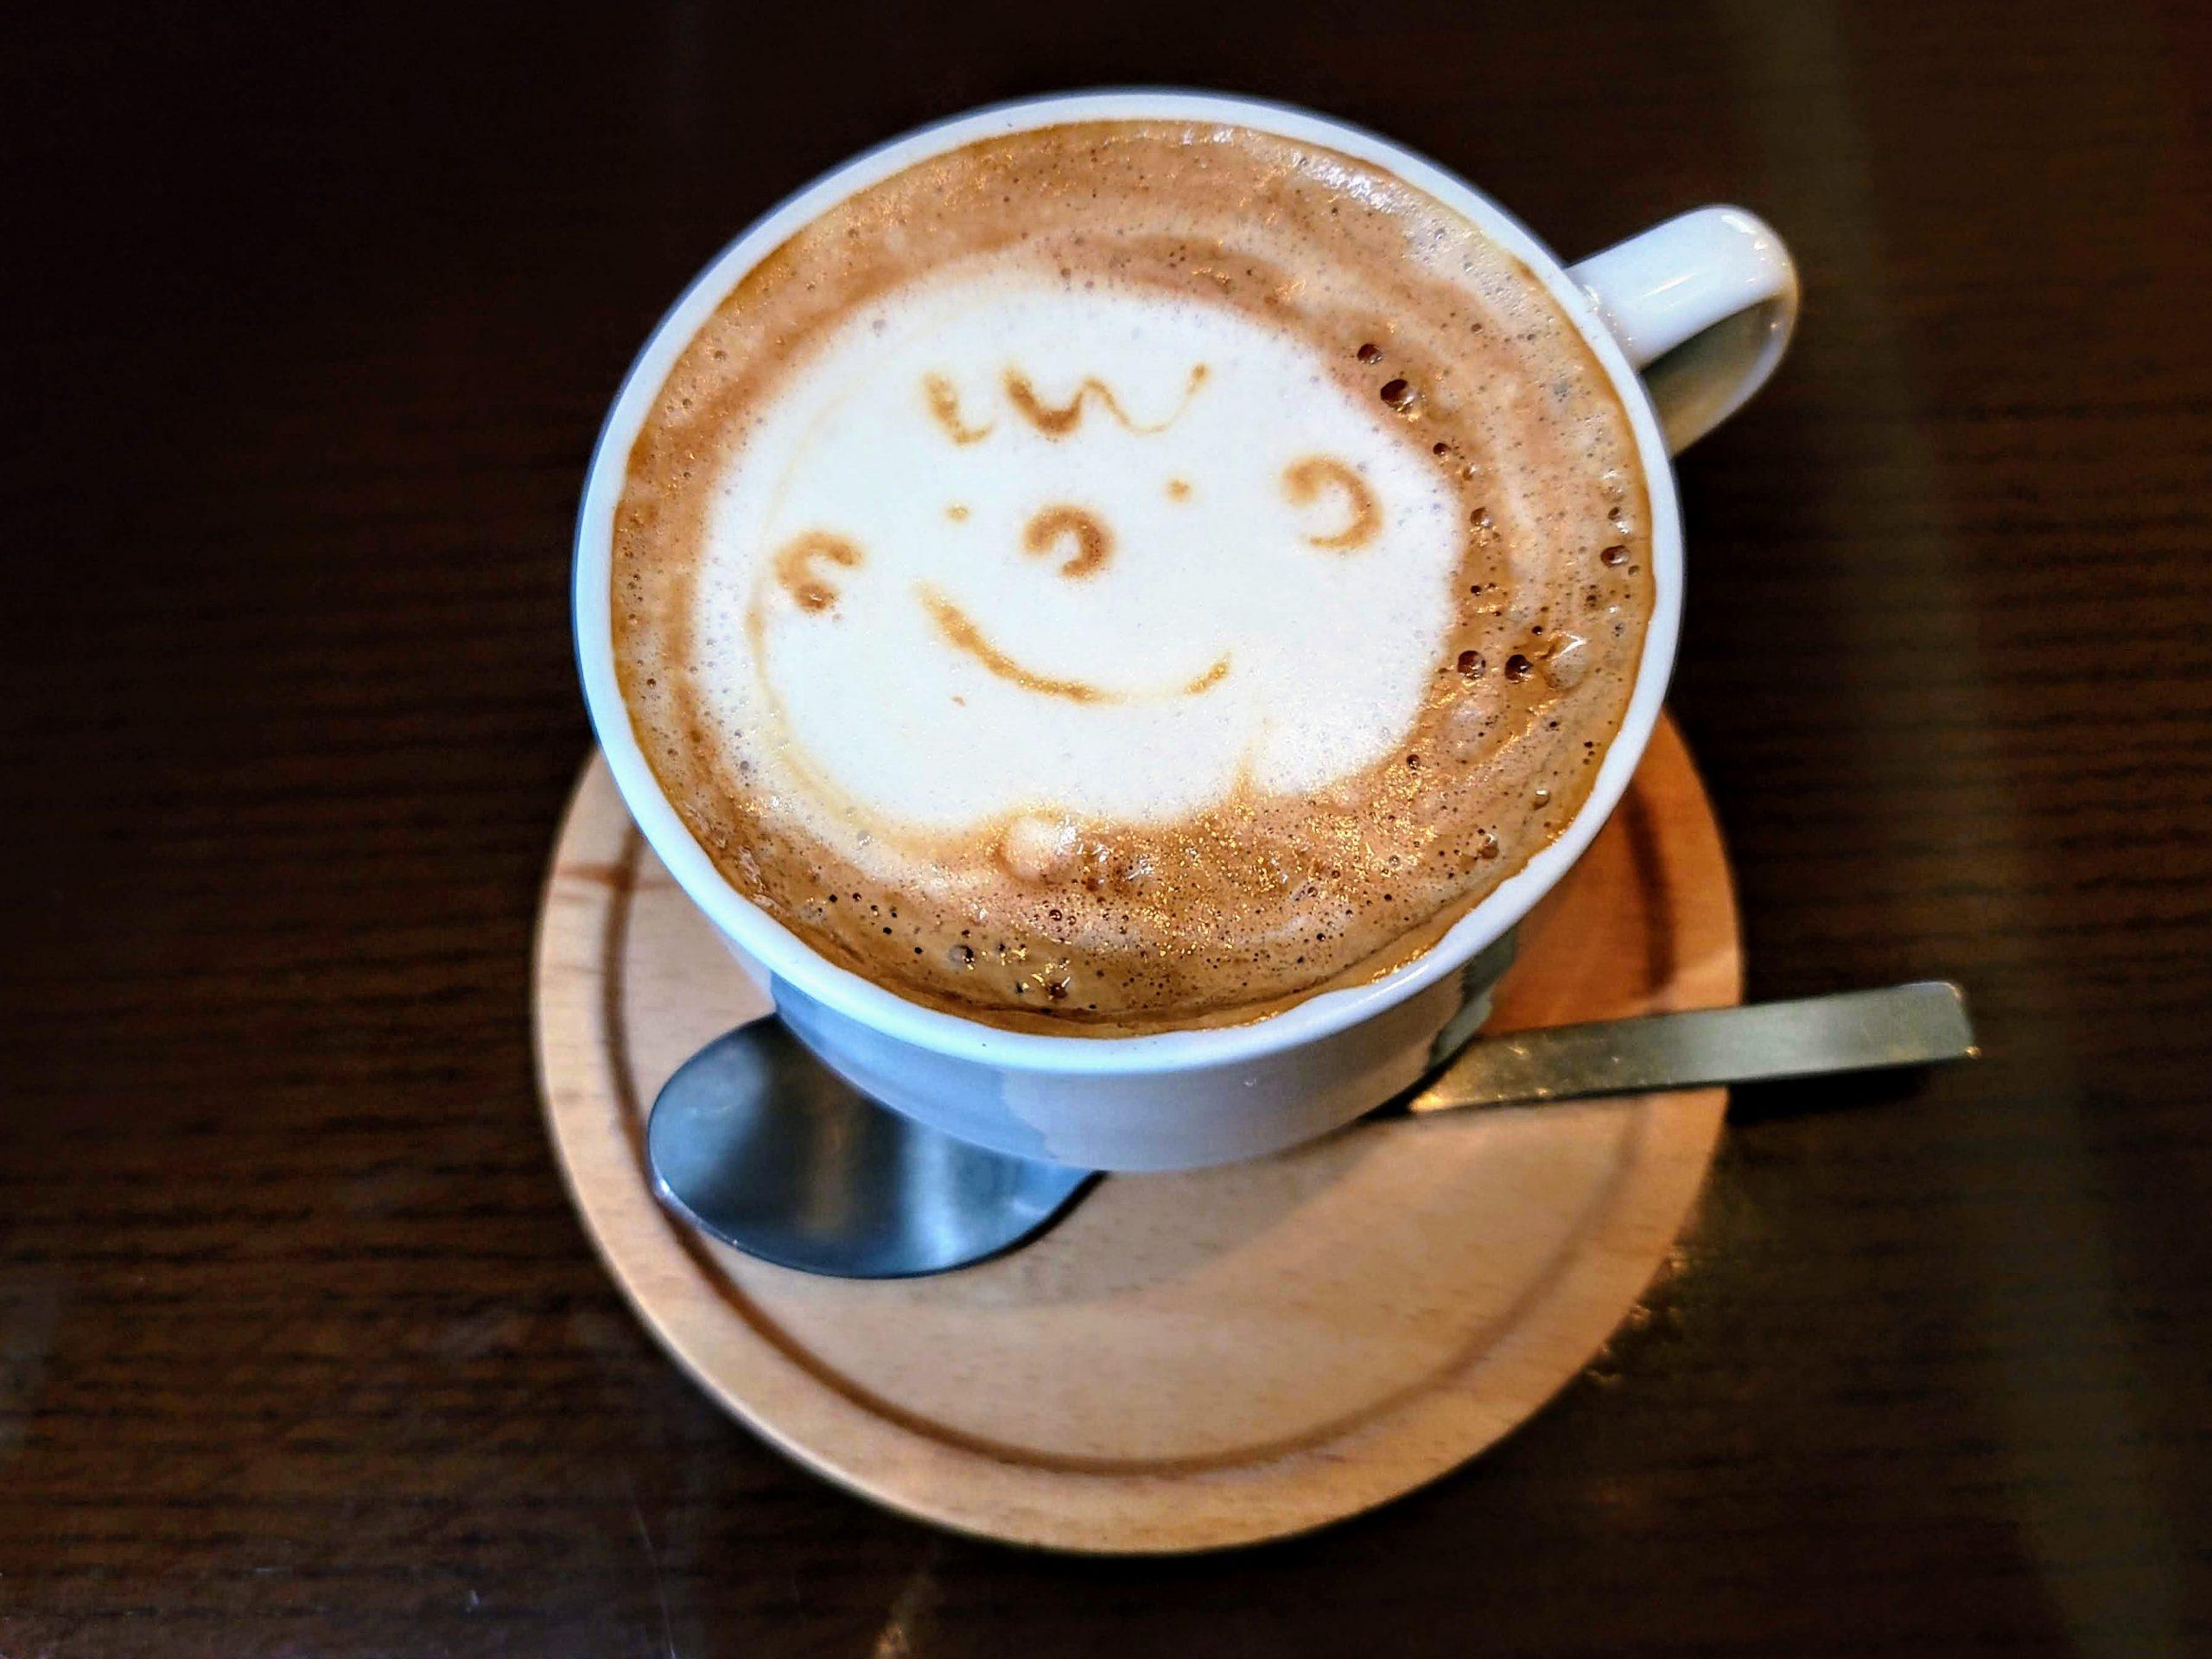 Latte Art from Analog Cafe in Ebisu